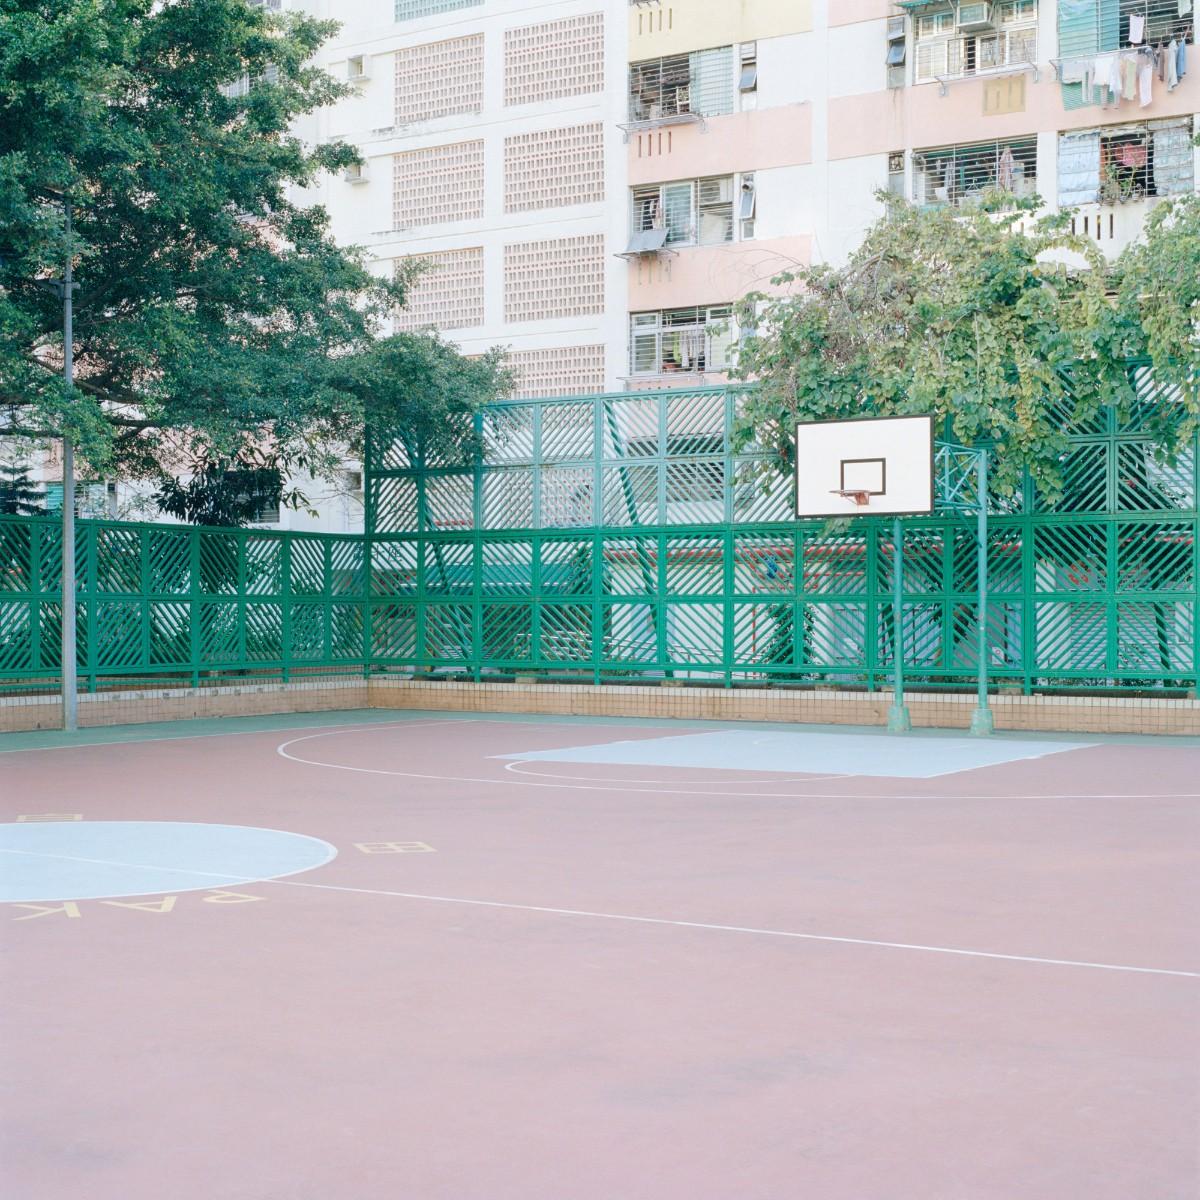 ward-roberts-courts-02.4-d45072d0ad3f7c8c5ab26a5f59dfb6ef